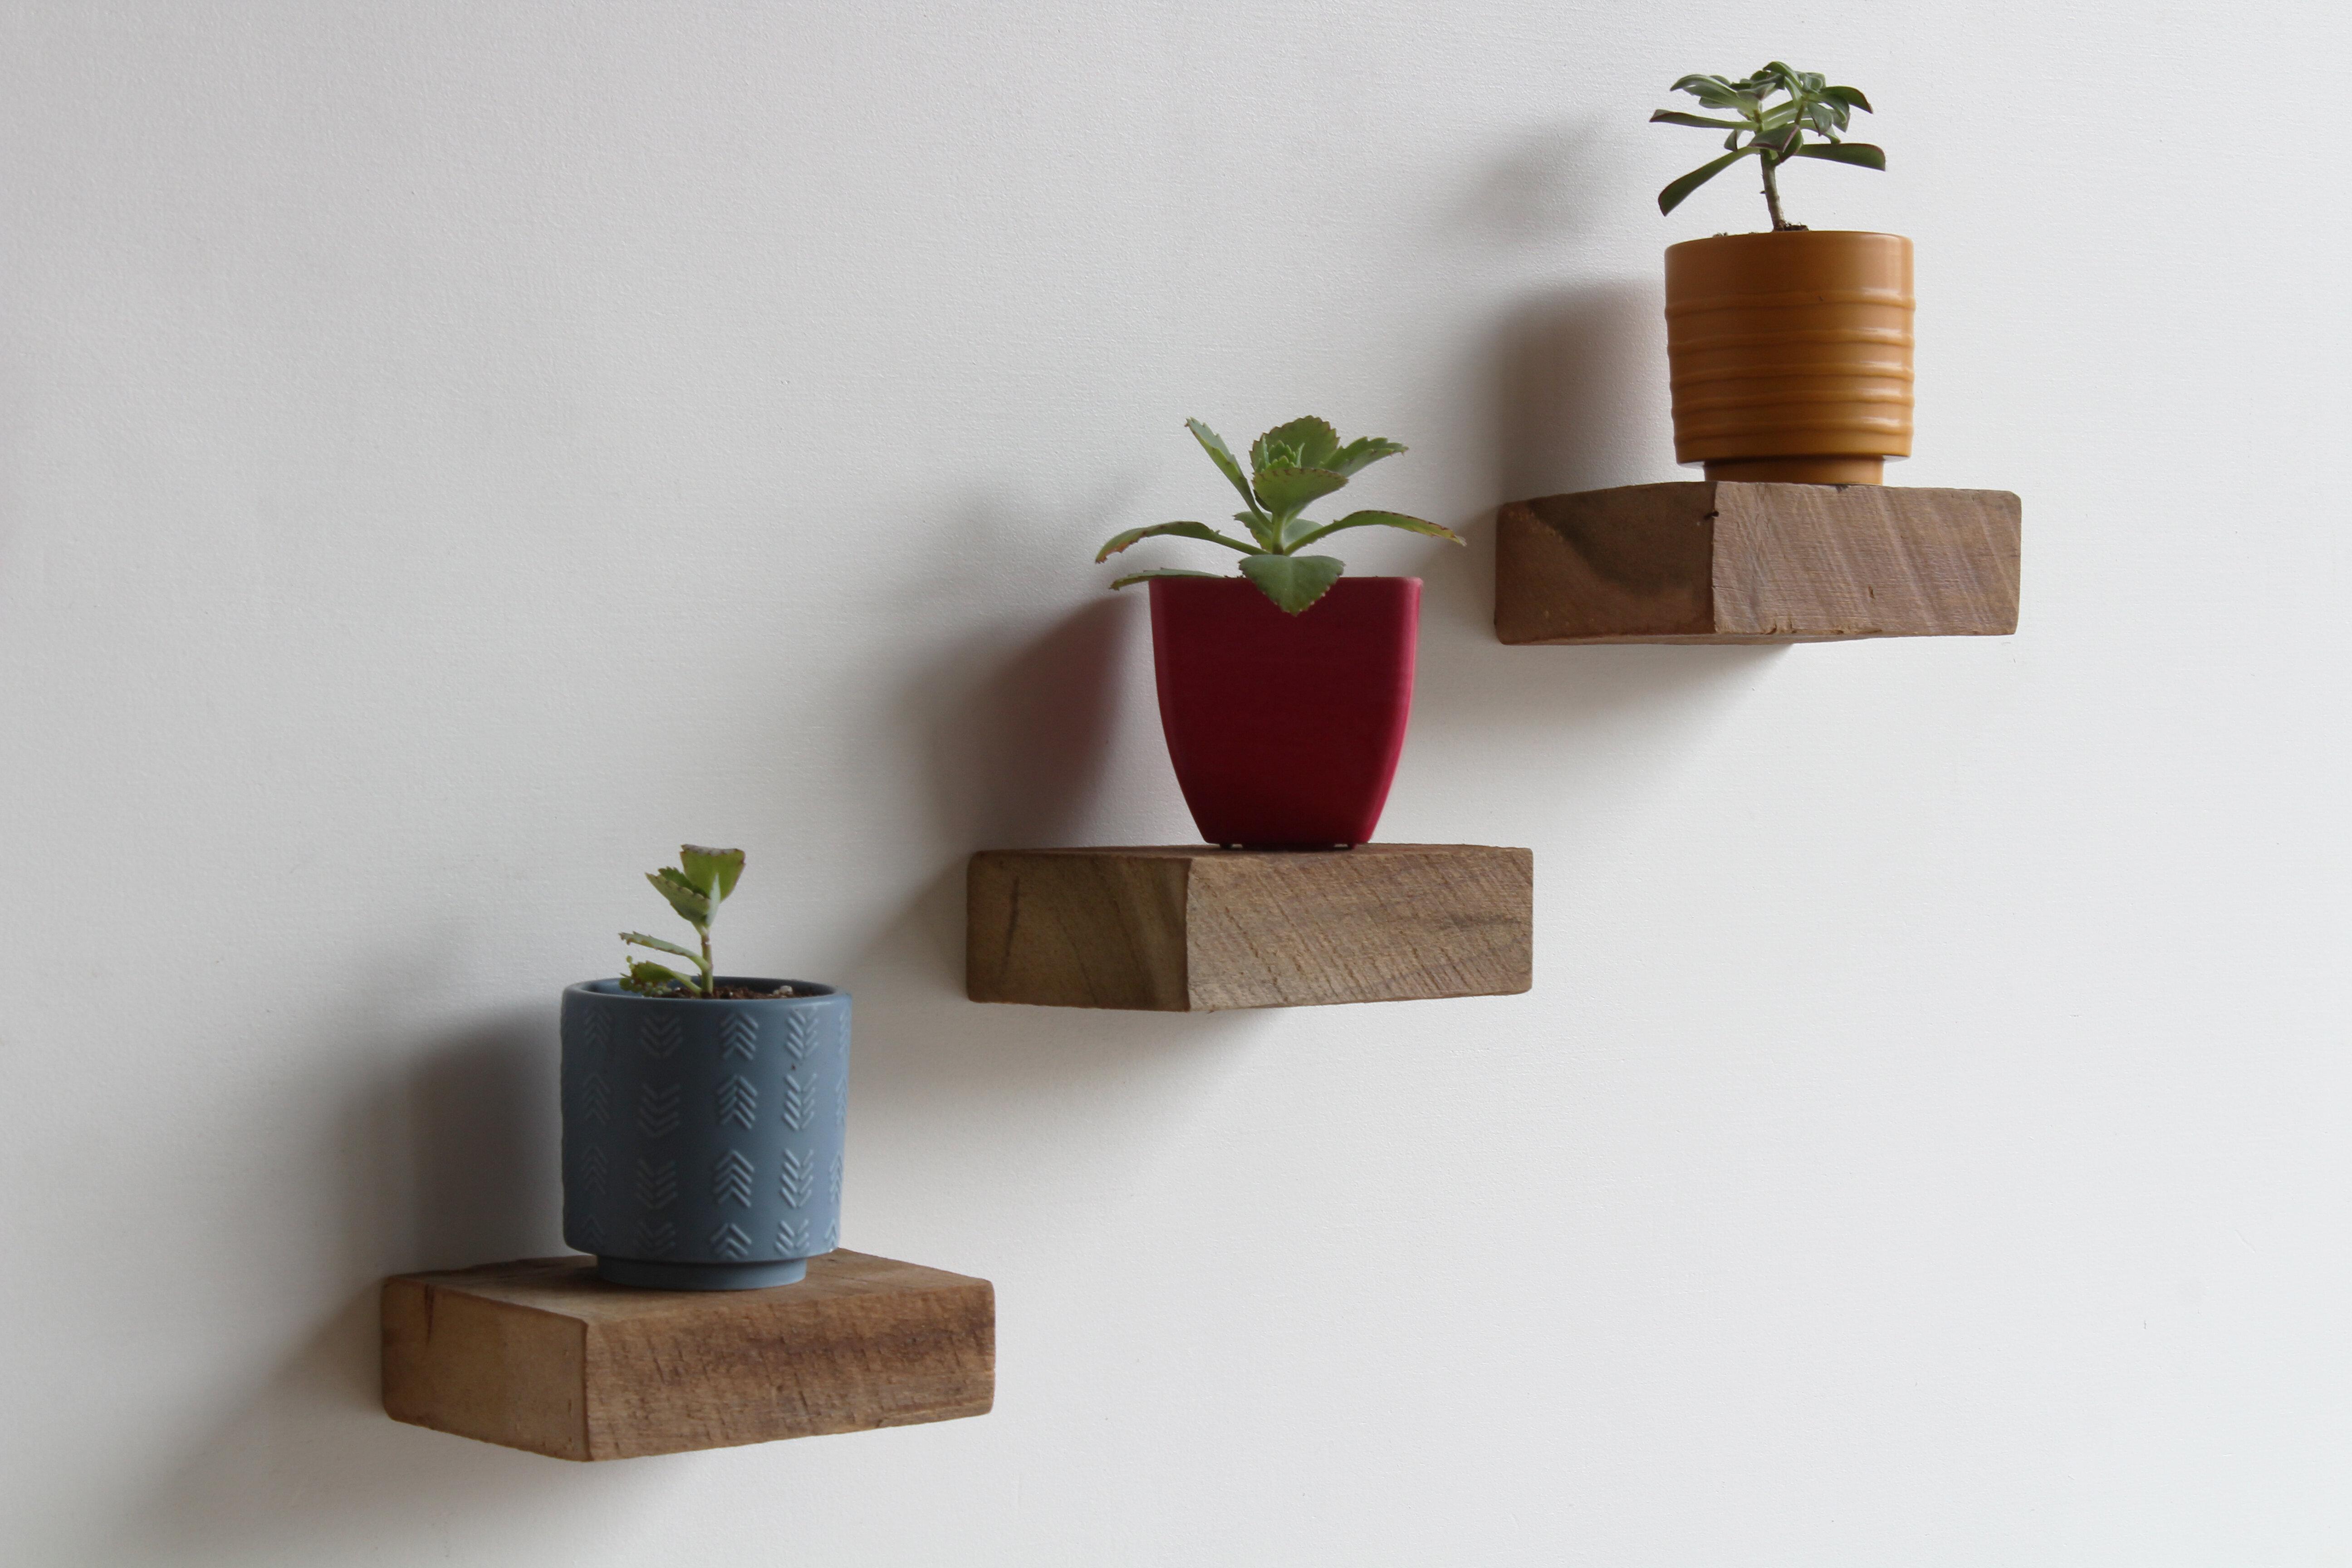 brayden studio salomon 3 solid wood floating shelf w